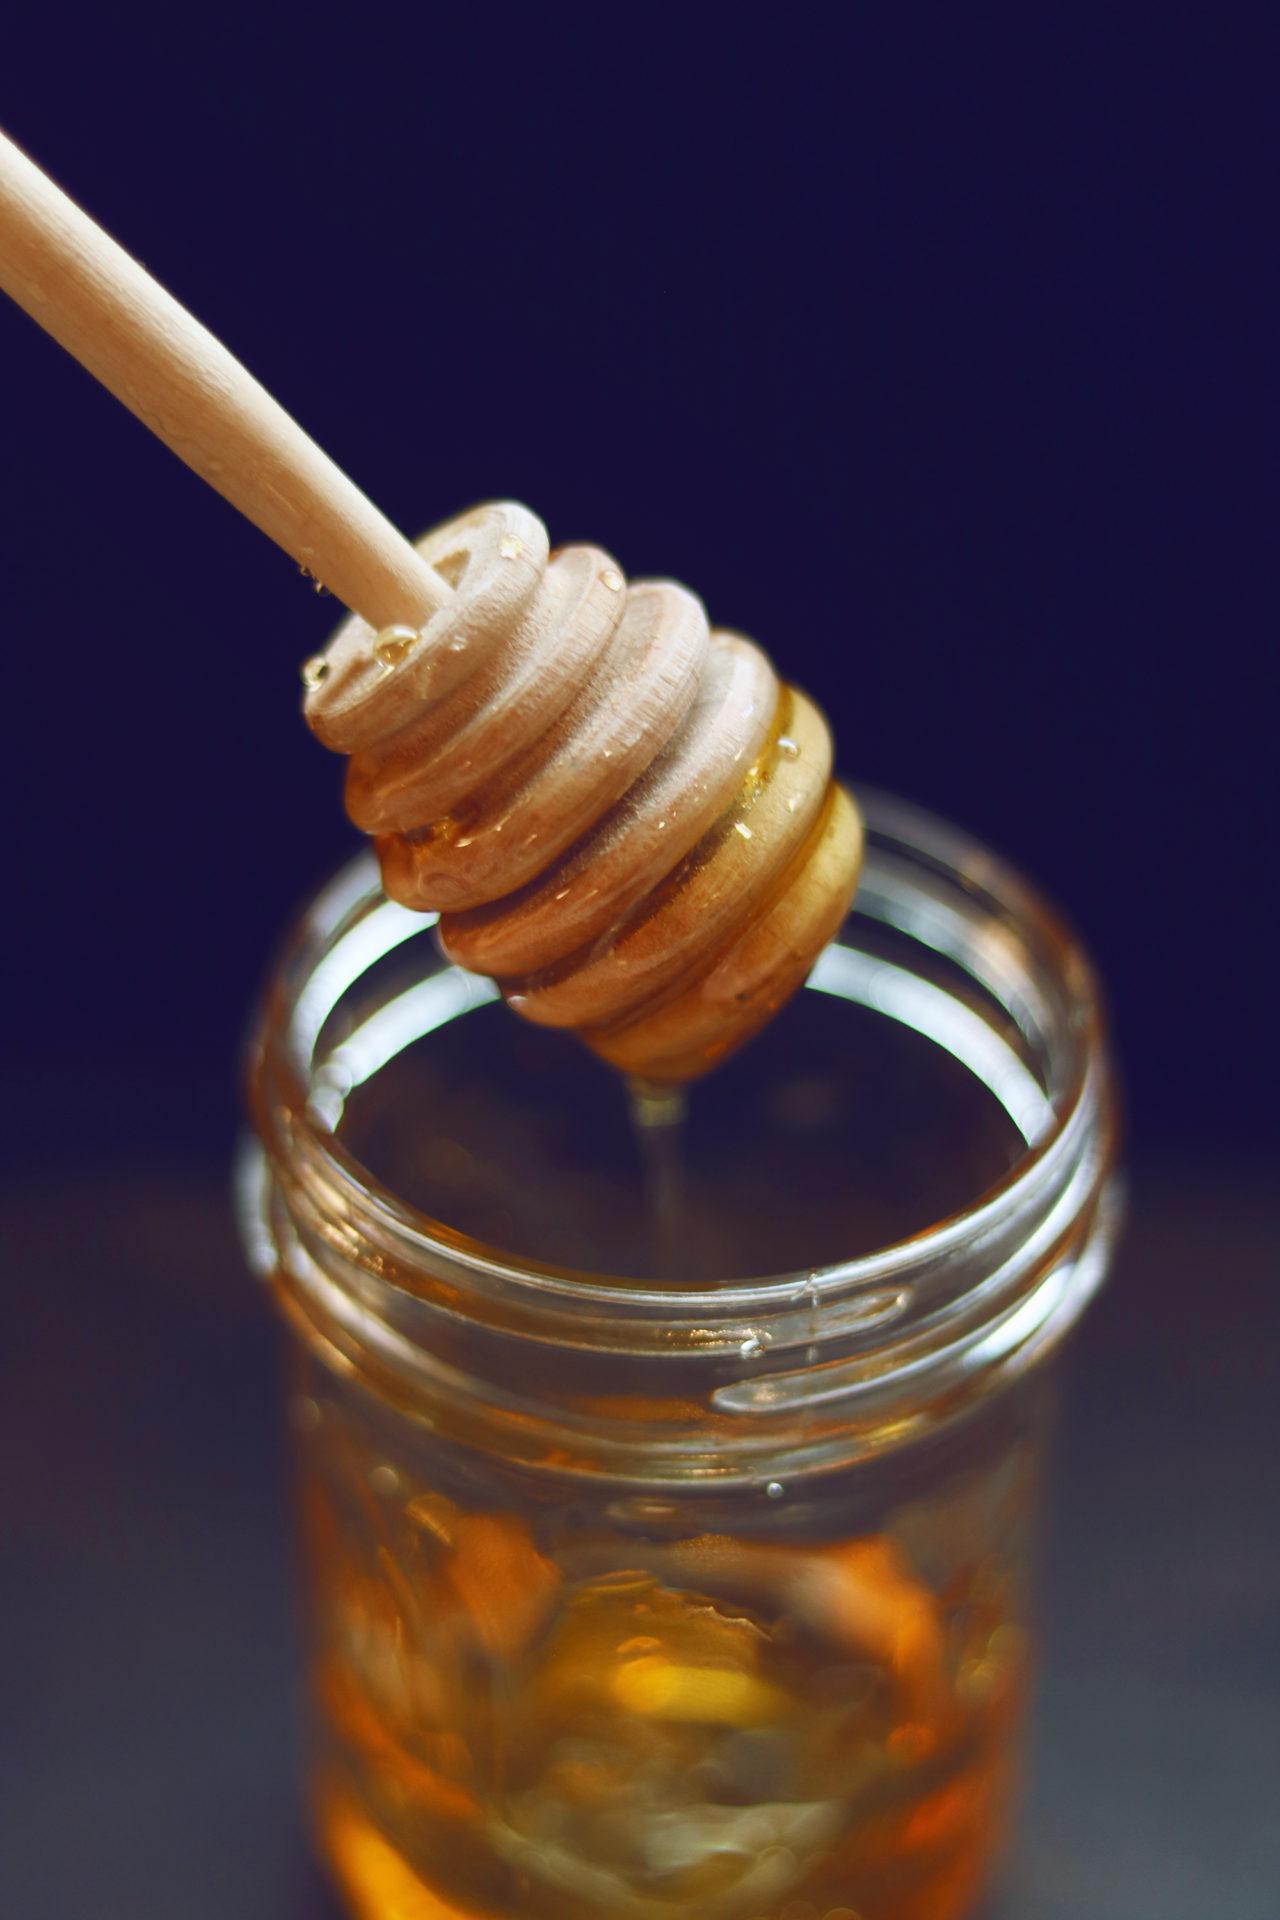 Honey and Litha